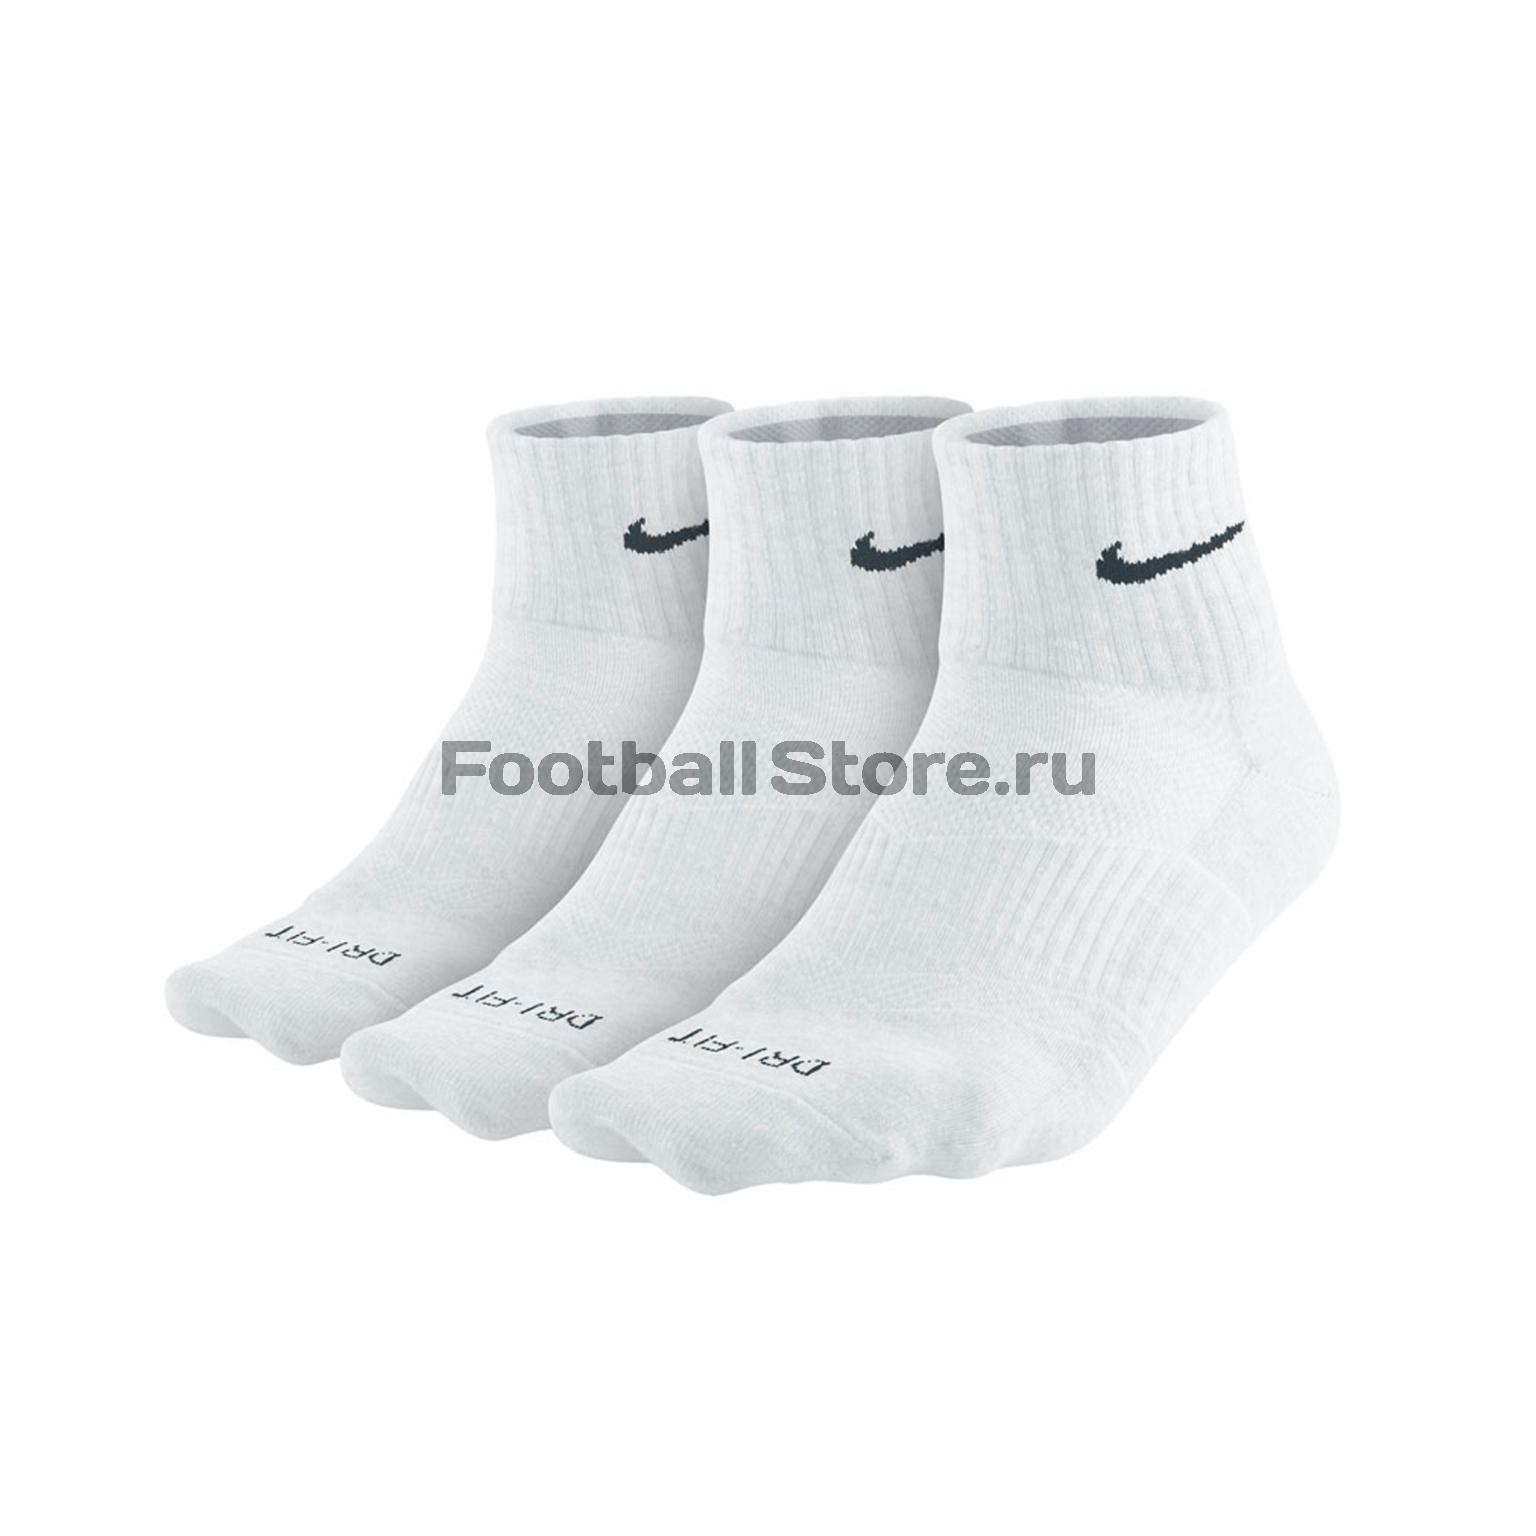 Комплект носков Nike 3PPK D-F Lightweight QTR SX4847-101